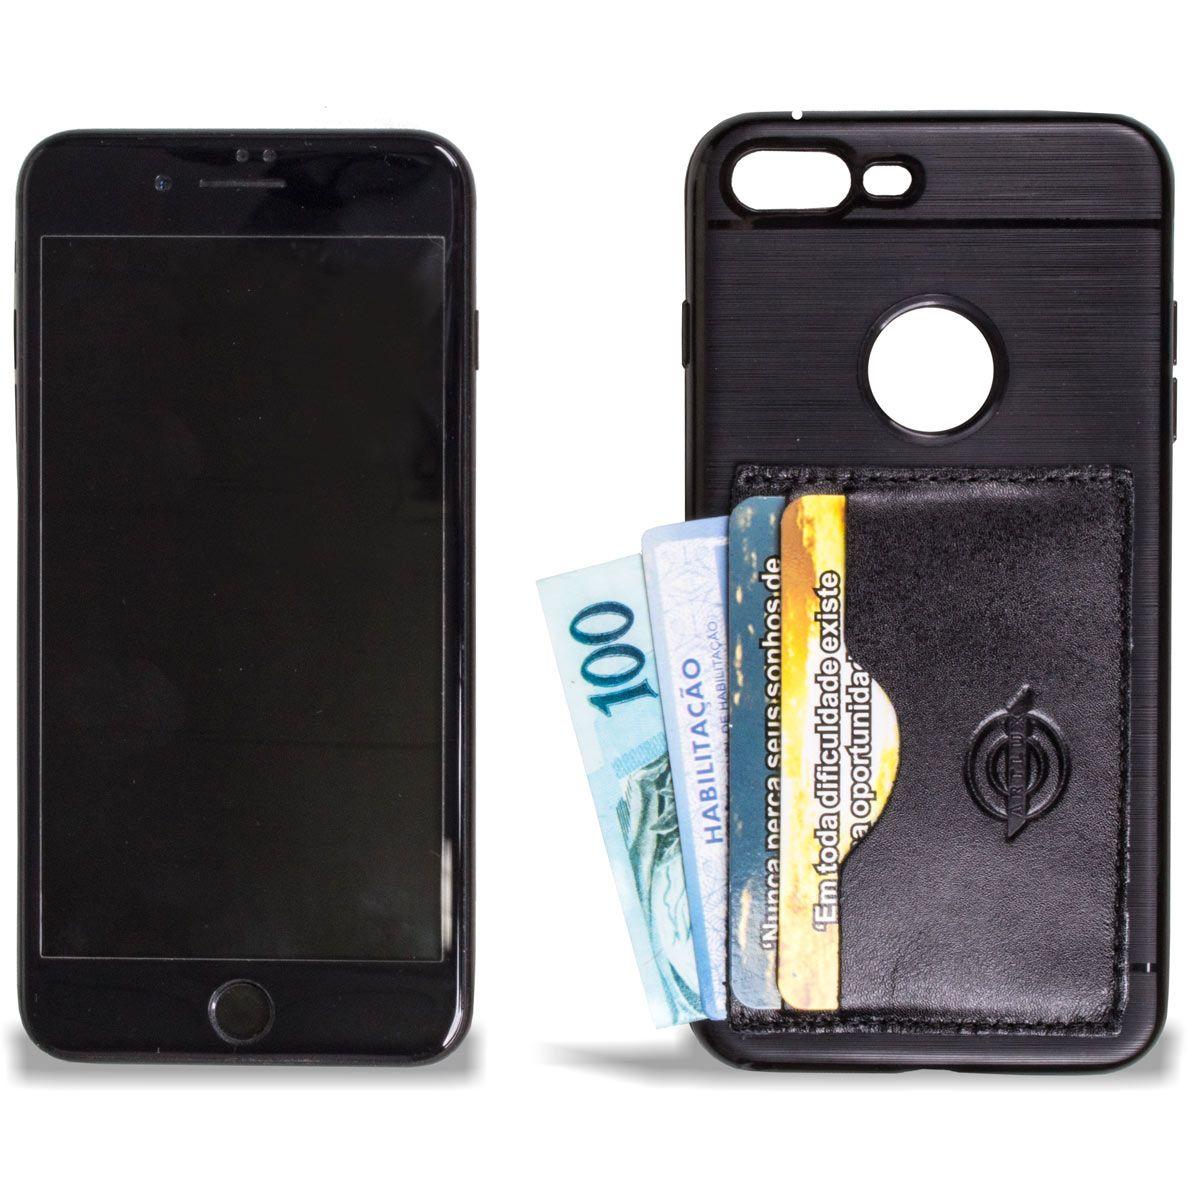 Kit Case para Iphone Plus 7 Black mais Porta Fone